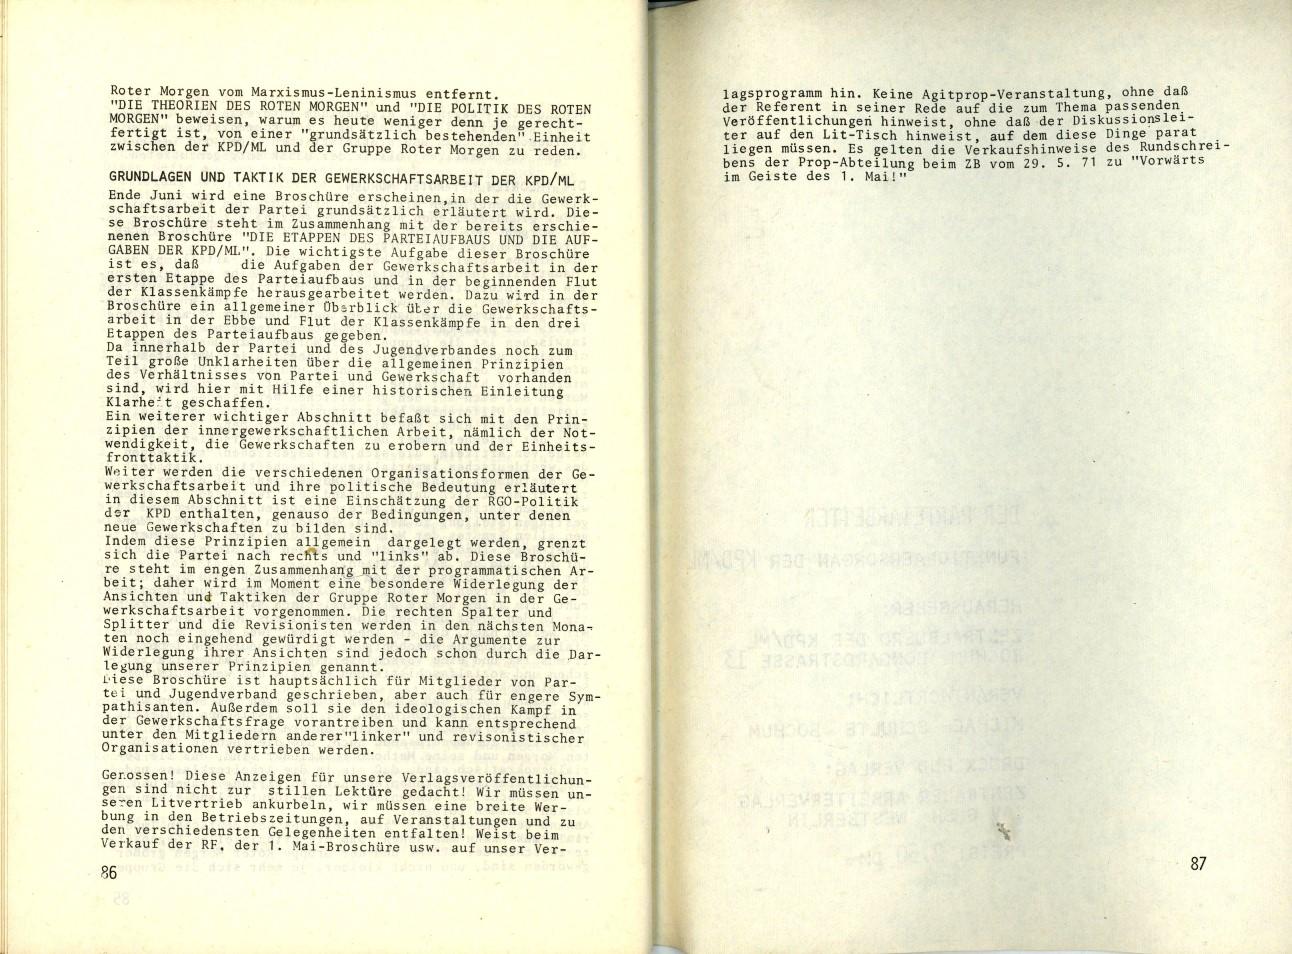 ZB_Parteiarbeiter_1971_06_45